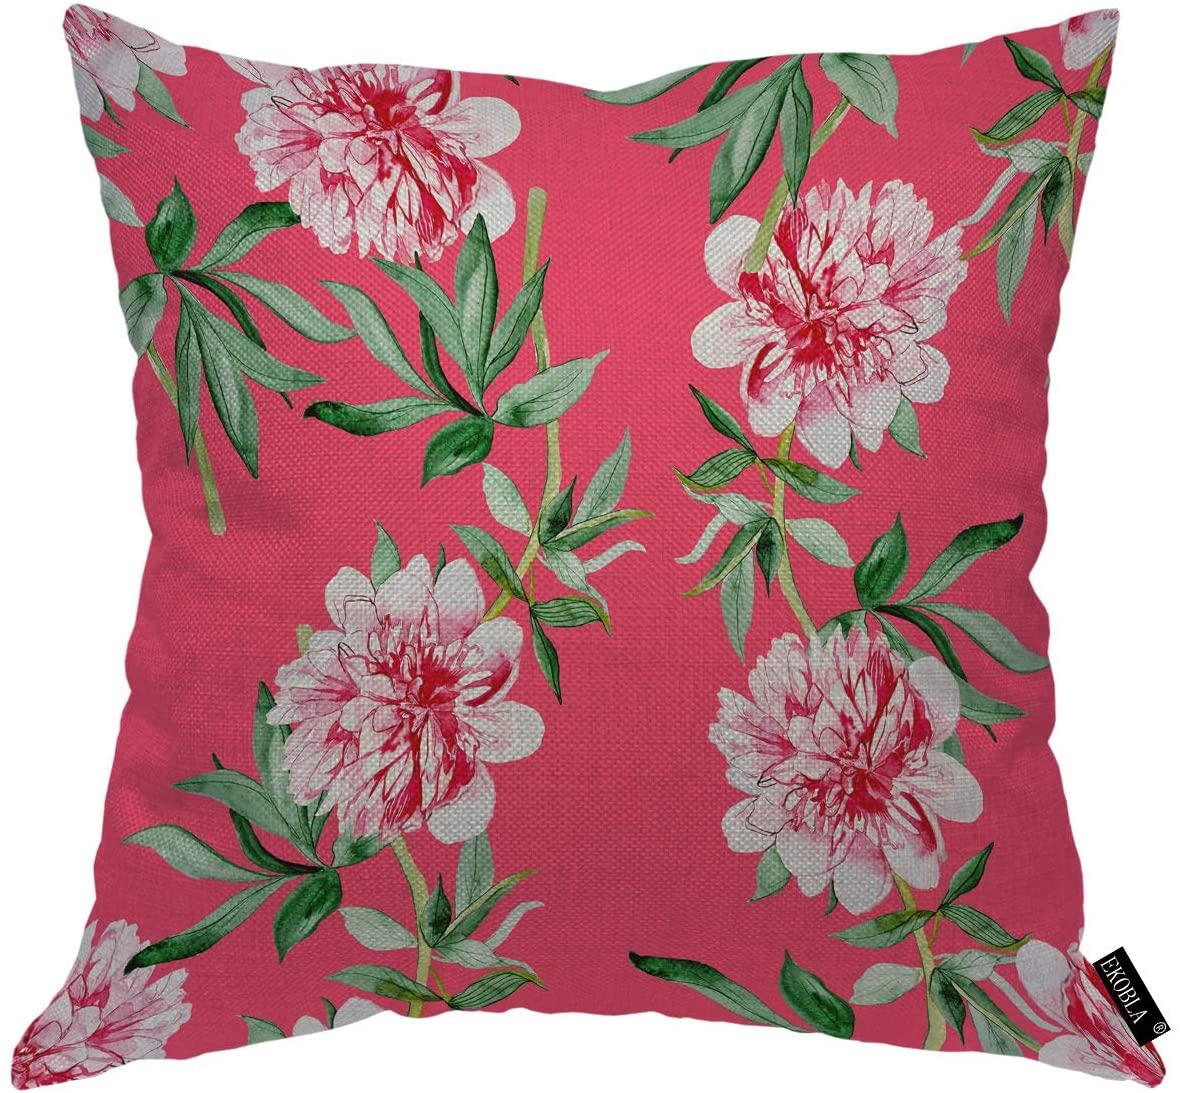 EKOBLA Peony Throw Pillow Covers Watercolor Flowers Elegance Green Leaf Artistic Botanical Blossom Decorative Square Cushion Case for Men Women Boys Girls Home Decor Cotton Linen 20x20 Inch